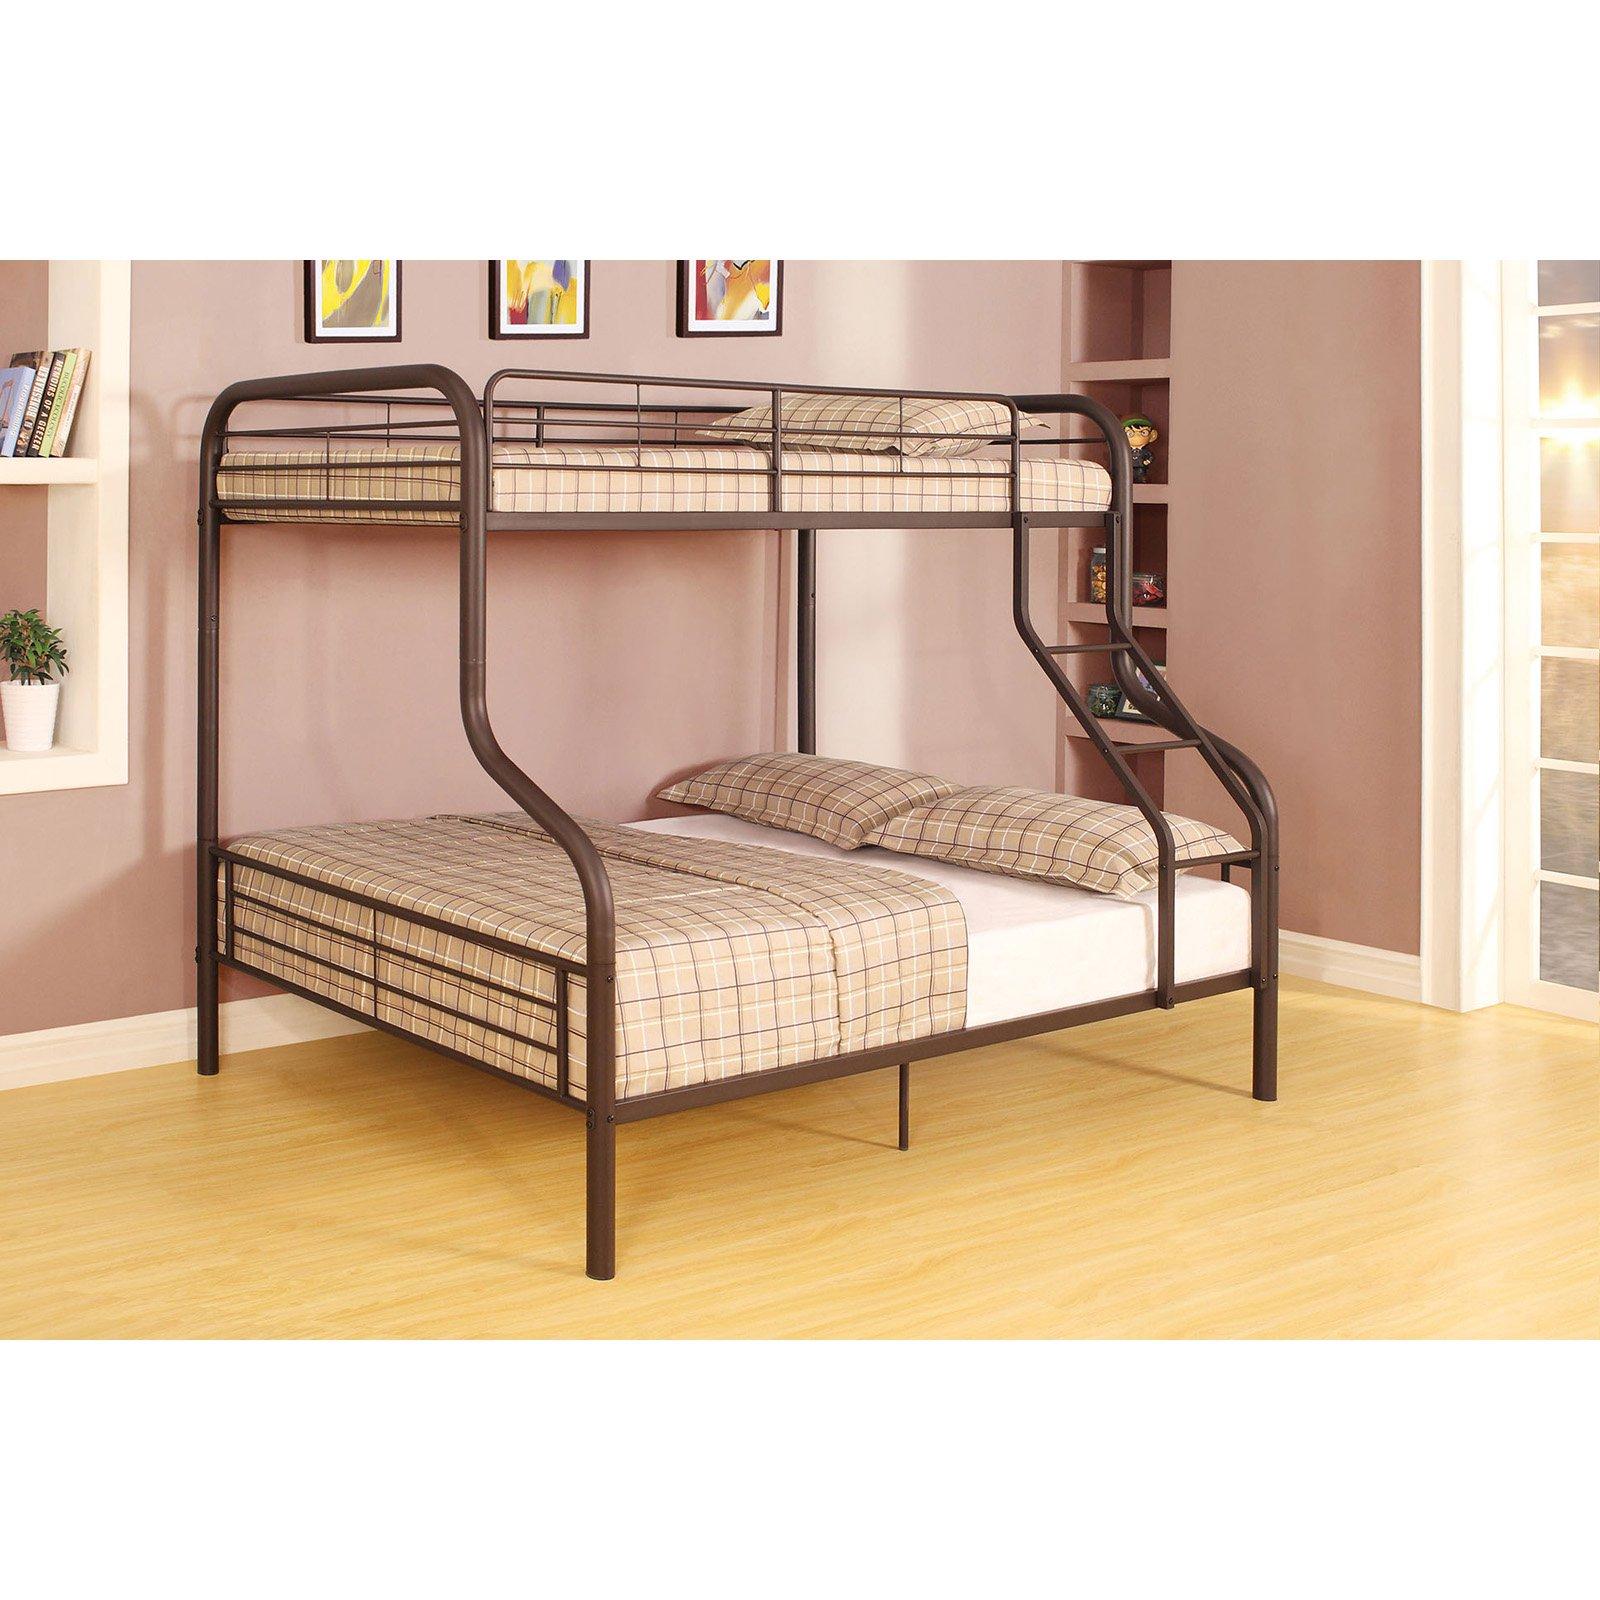 Cairo Twin/Full Bunk Bed, Sandy Black, Box 2 of 2